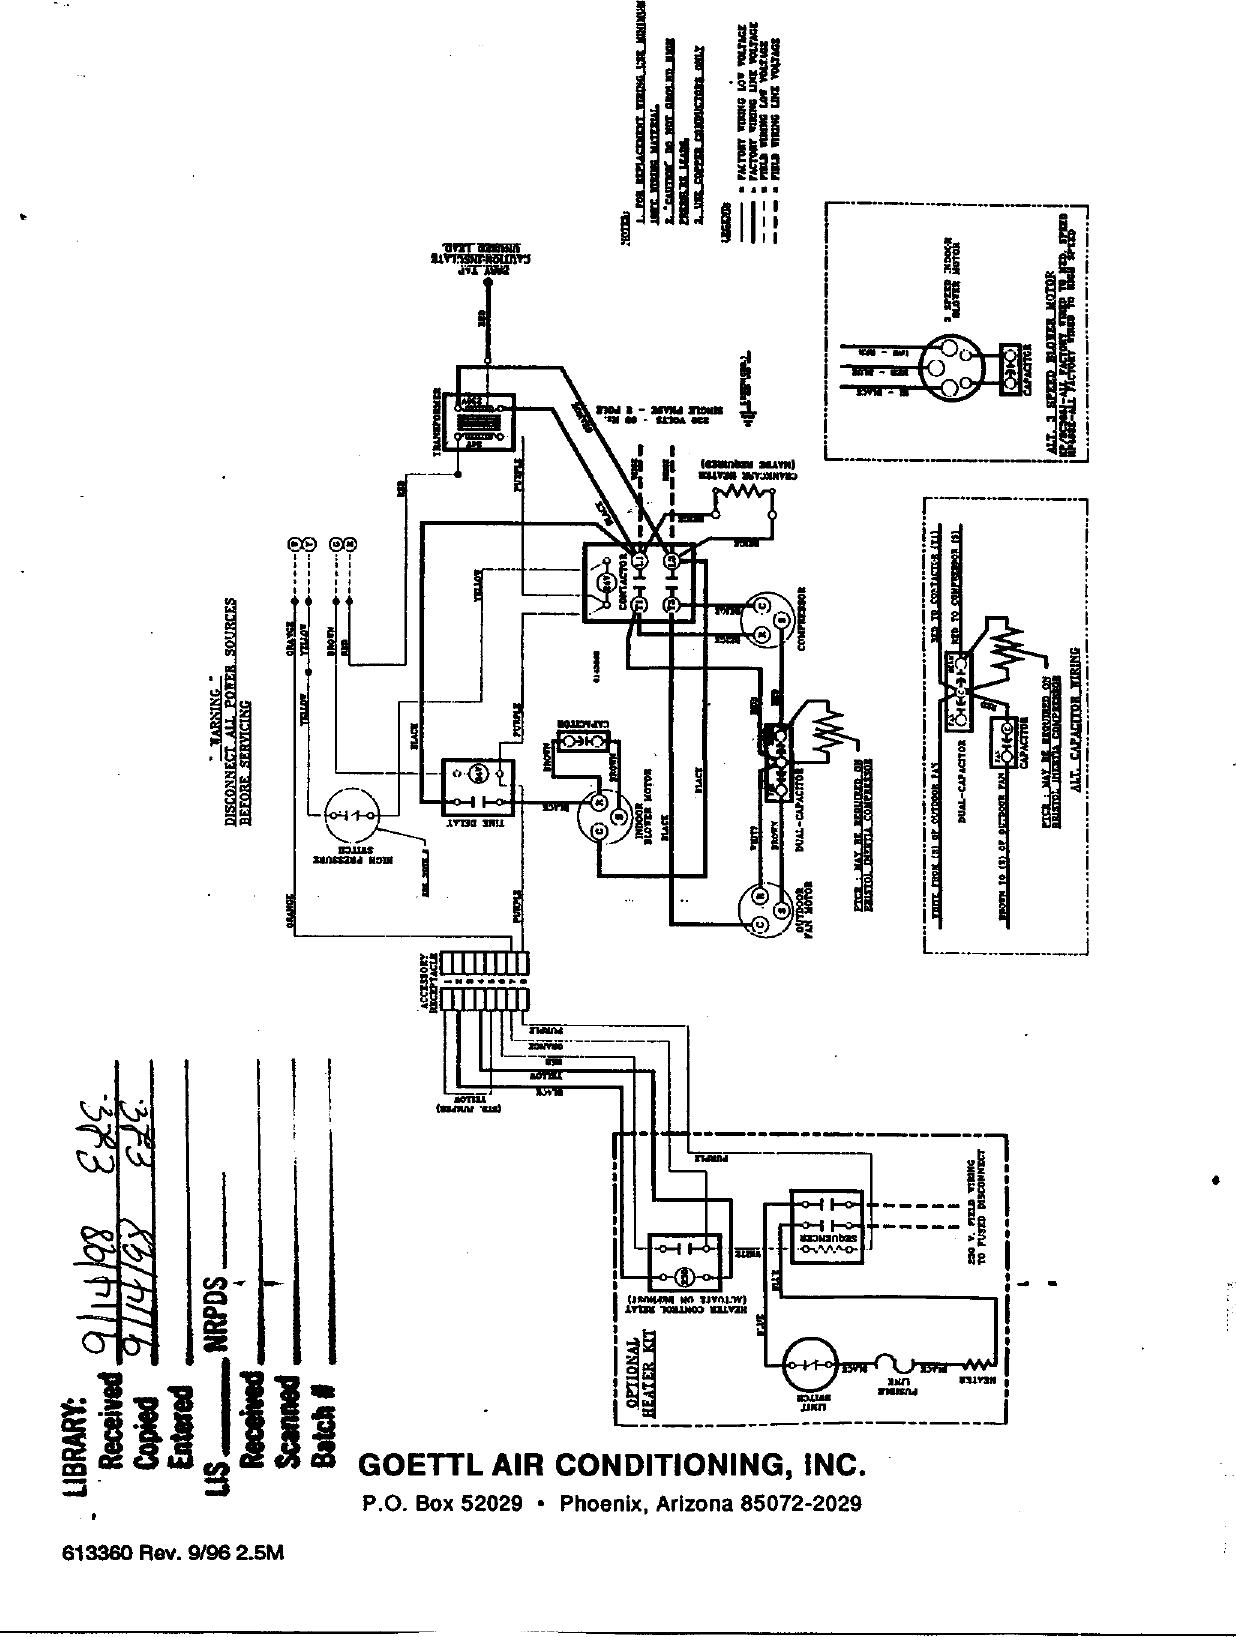 hight resolution of goettl air conditioning wiring diagram wiring diagram centregoettl air conditioning wiring diagram goettl air conditioner room